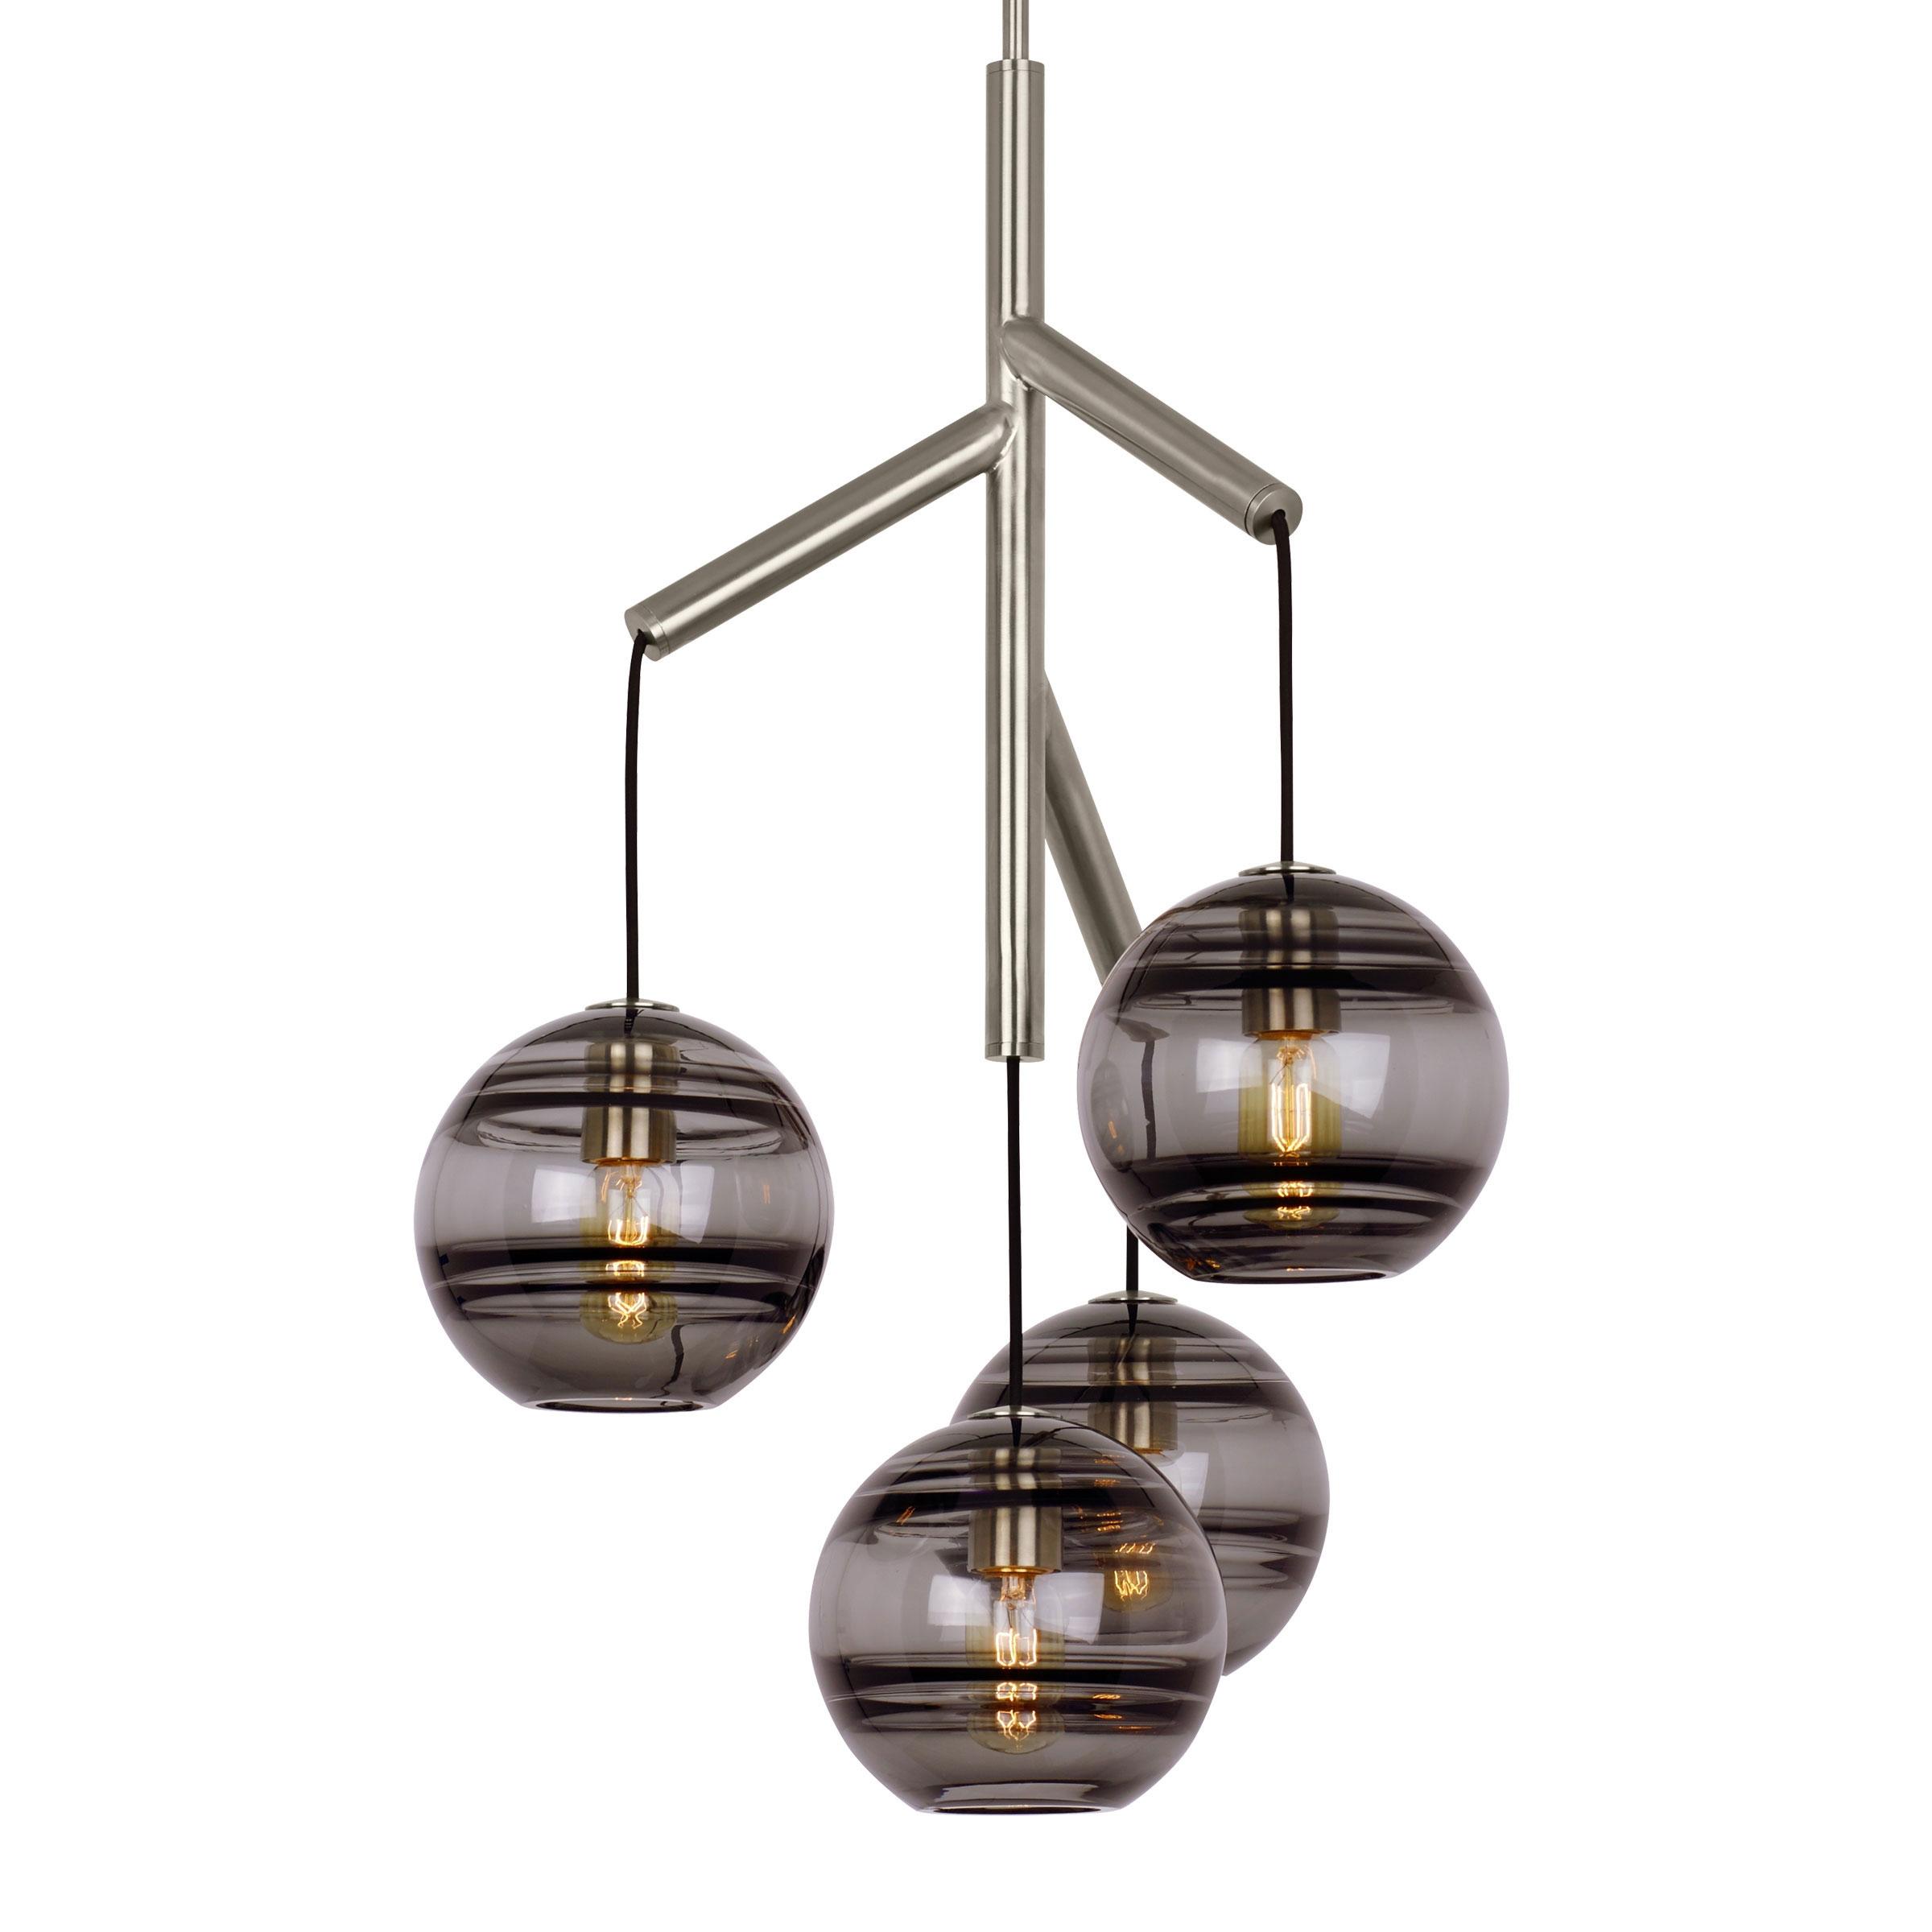 sedona chandelier by tech lighting 700sdnmpr1ks